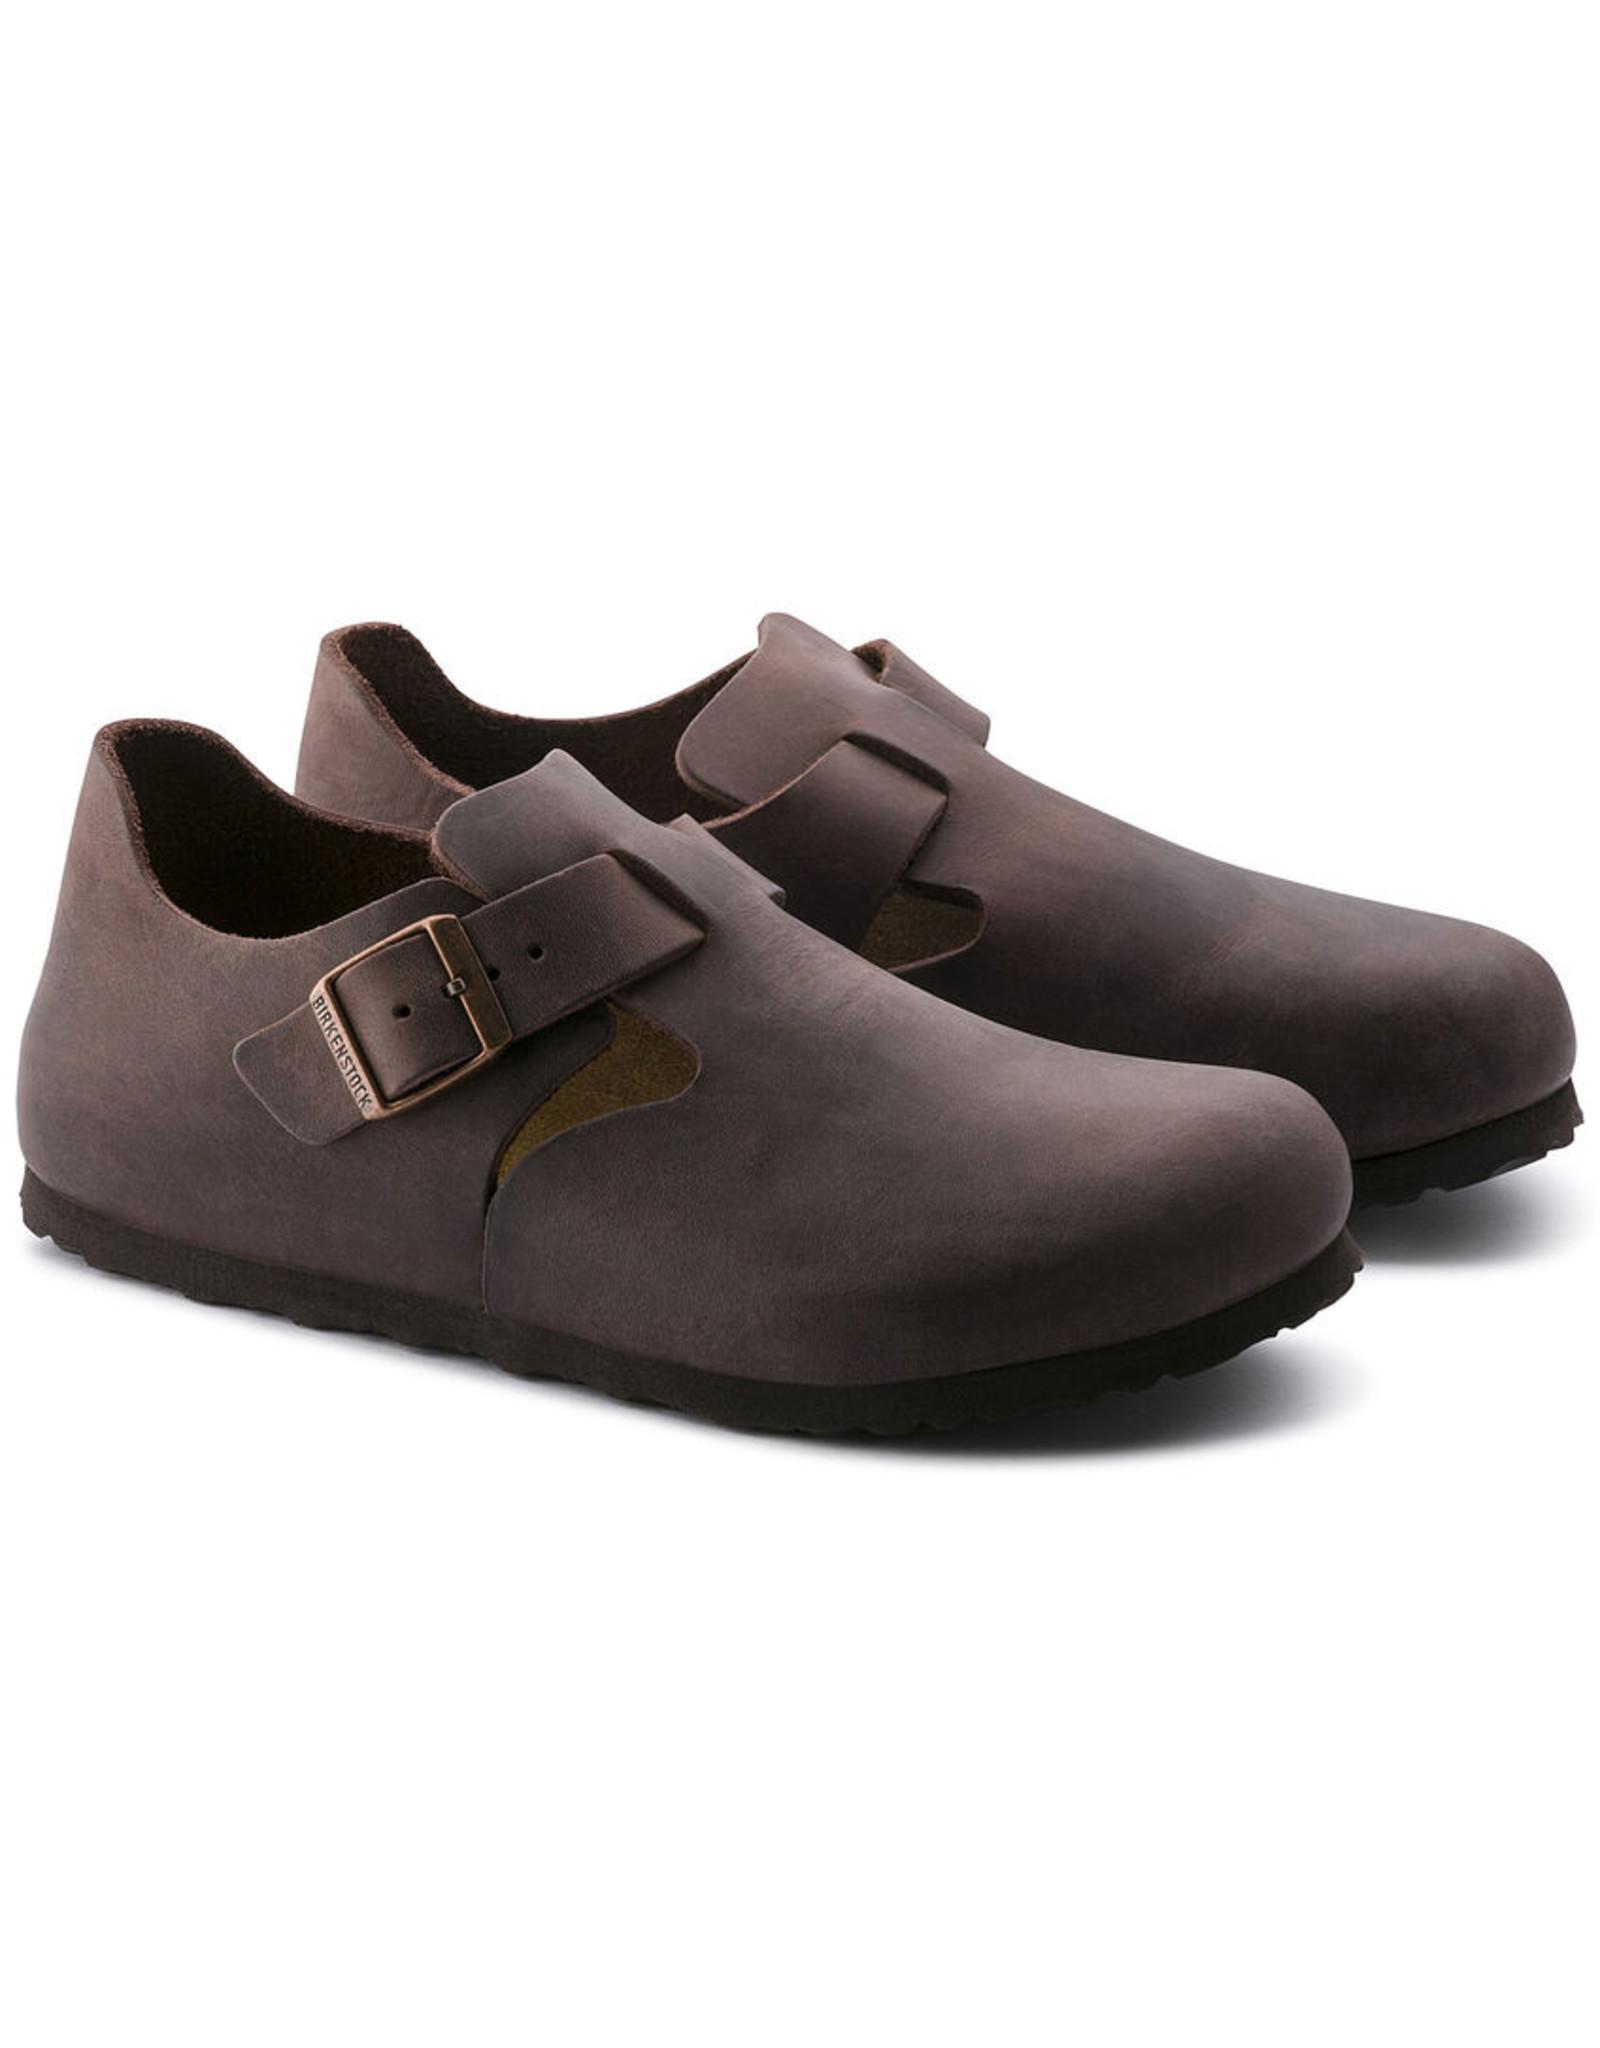 Birkenstock London Buckle Shoe-Habana